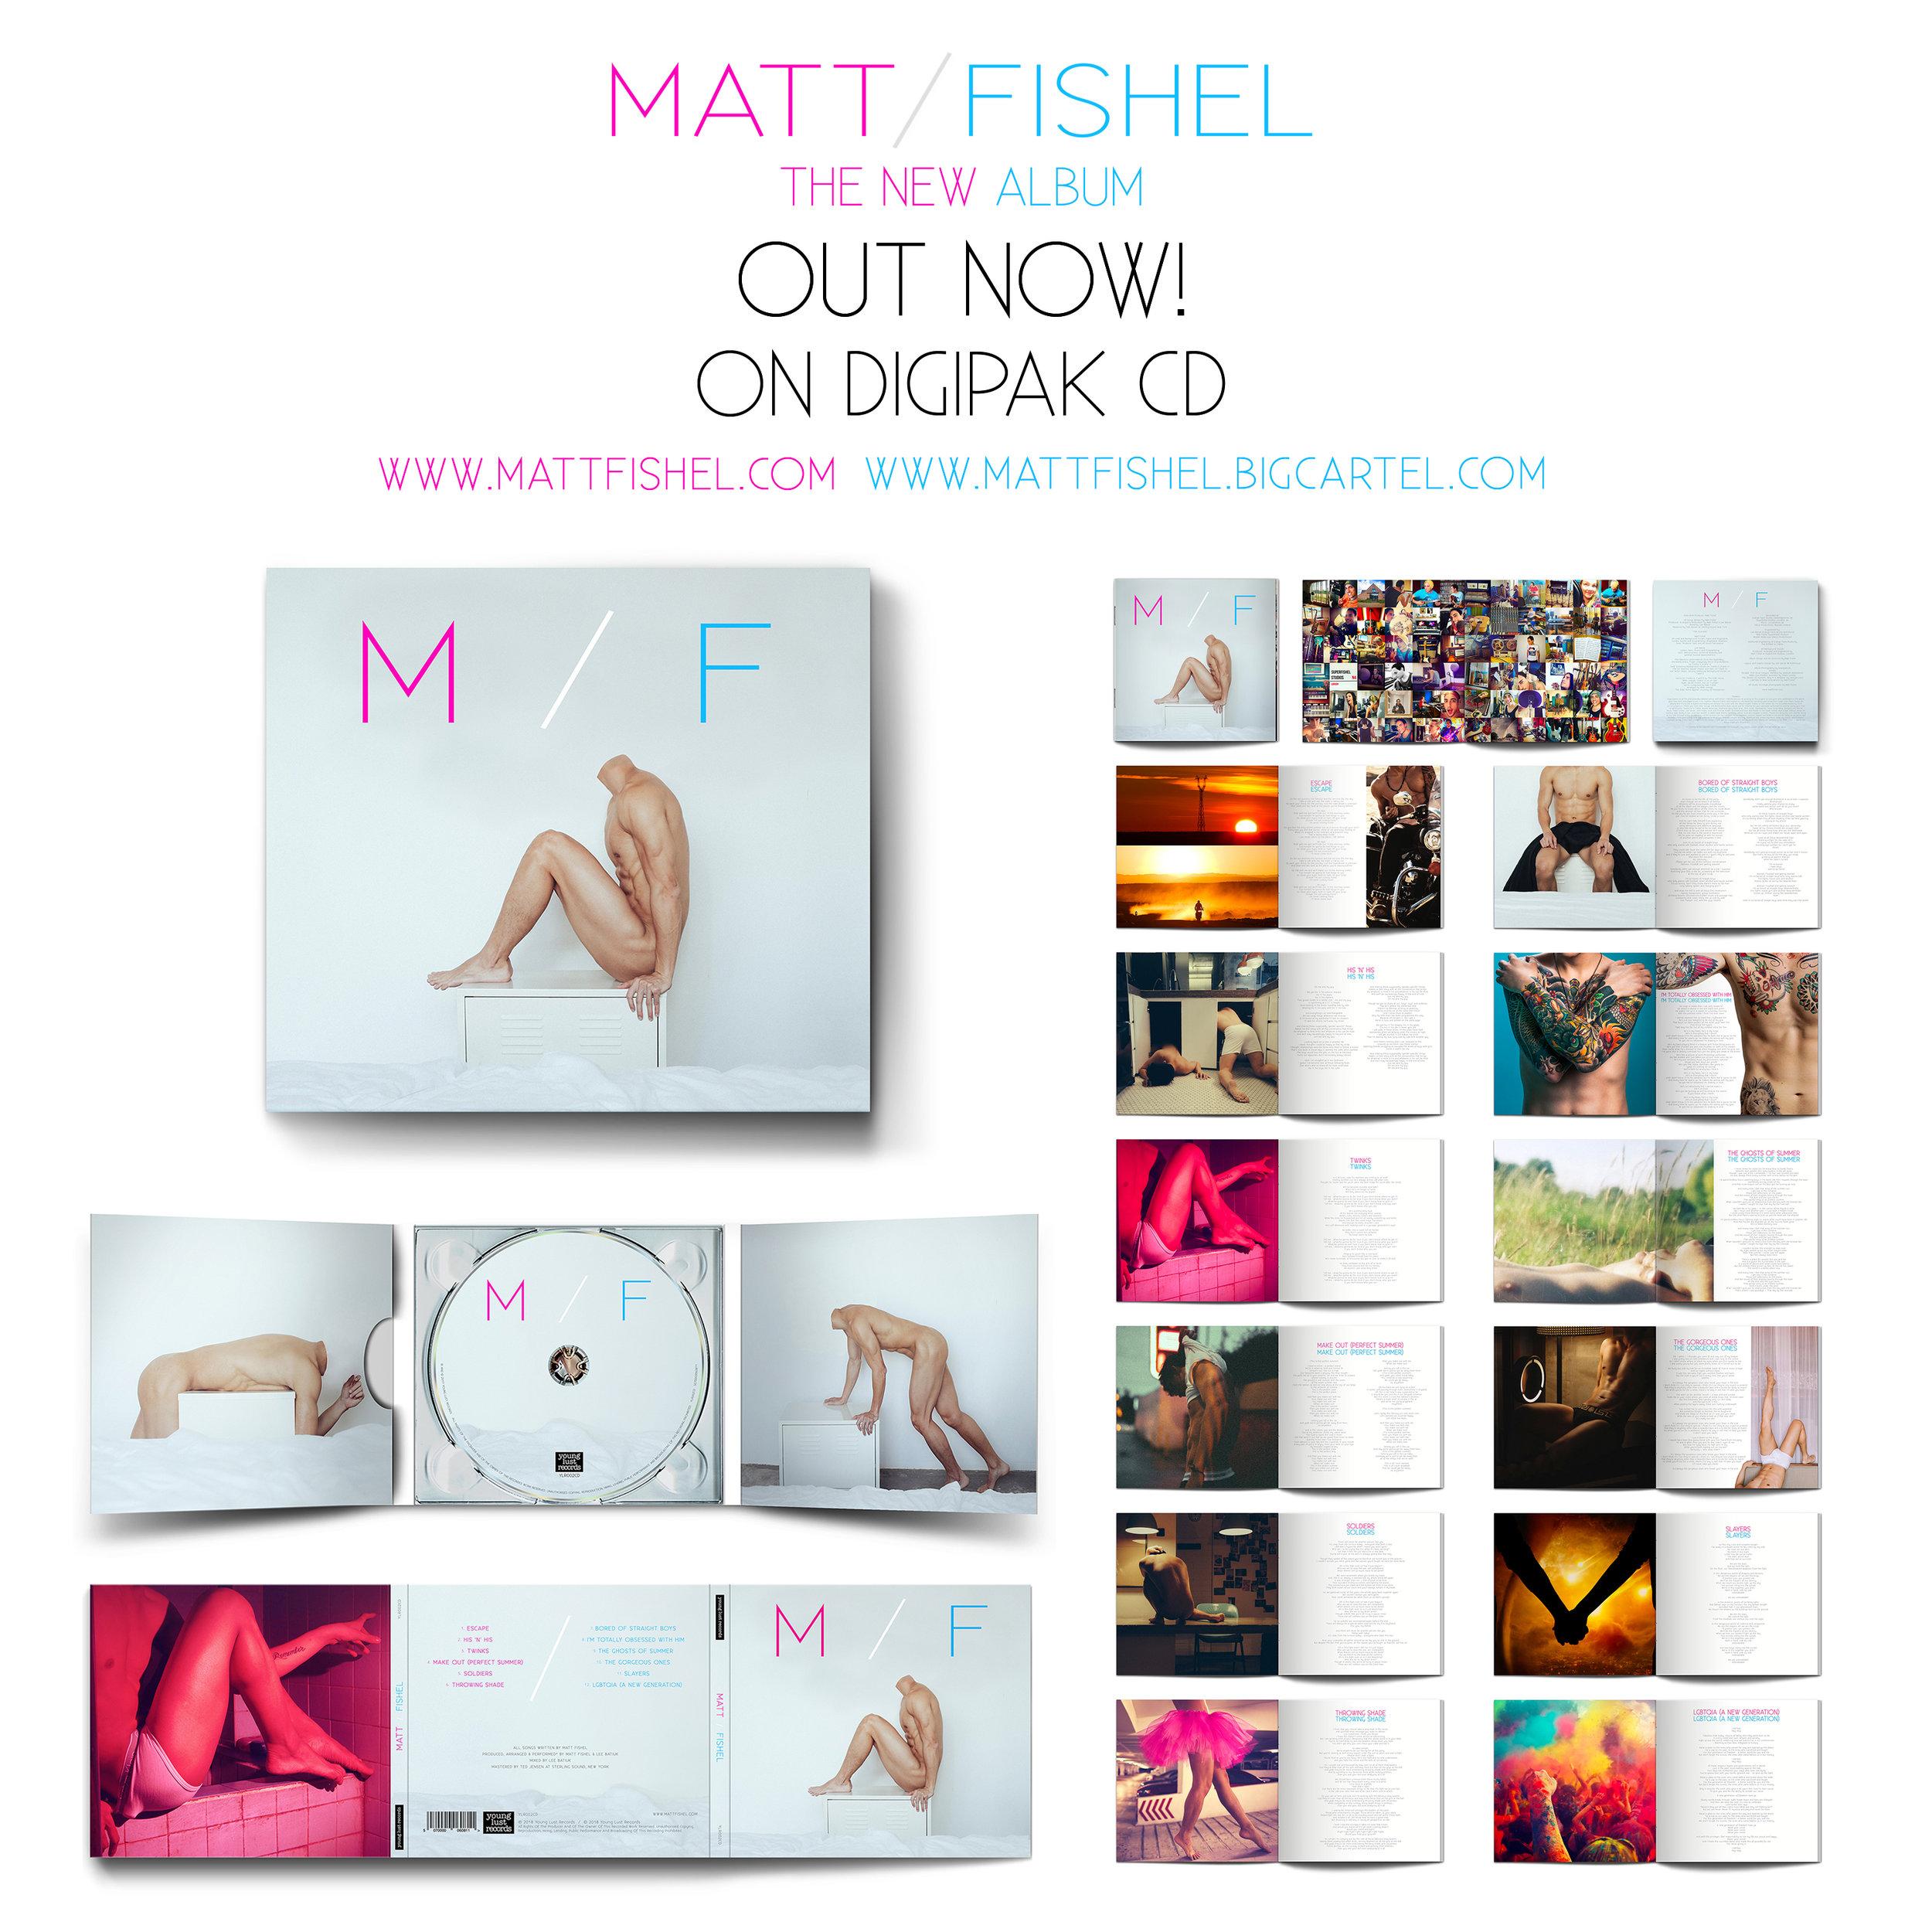 Matt Fishel_MF_OUT NOW_CD_2.jpg